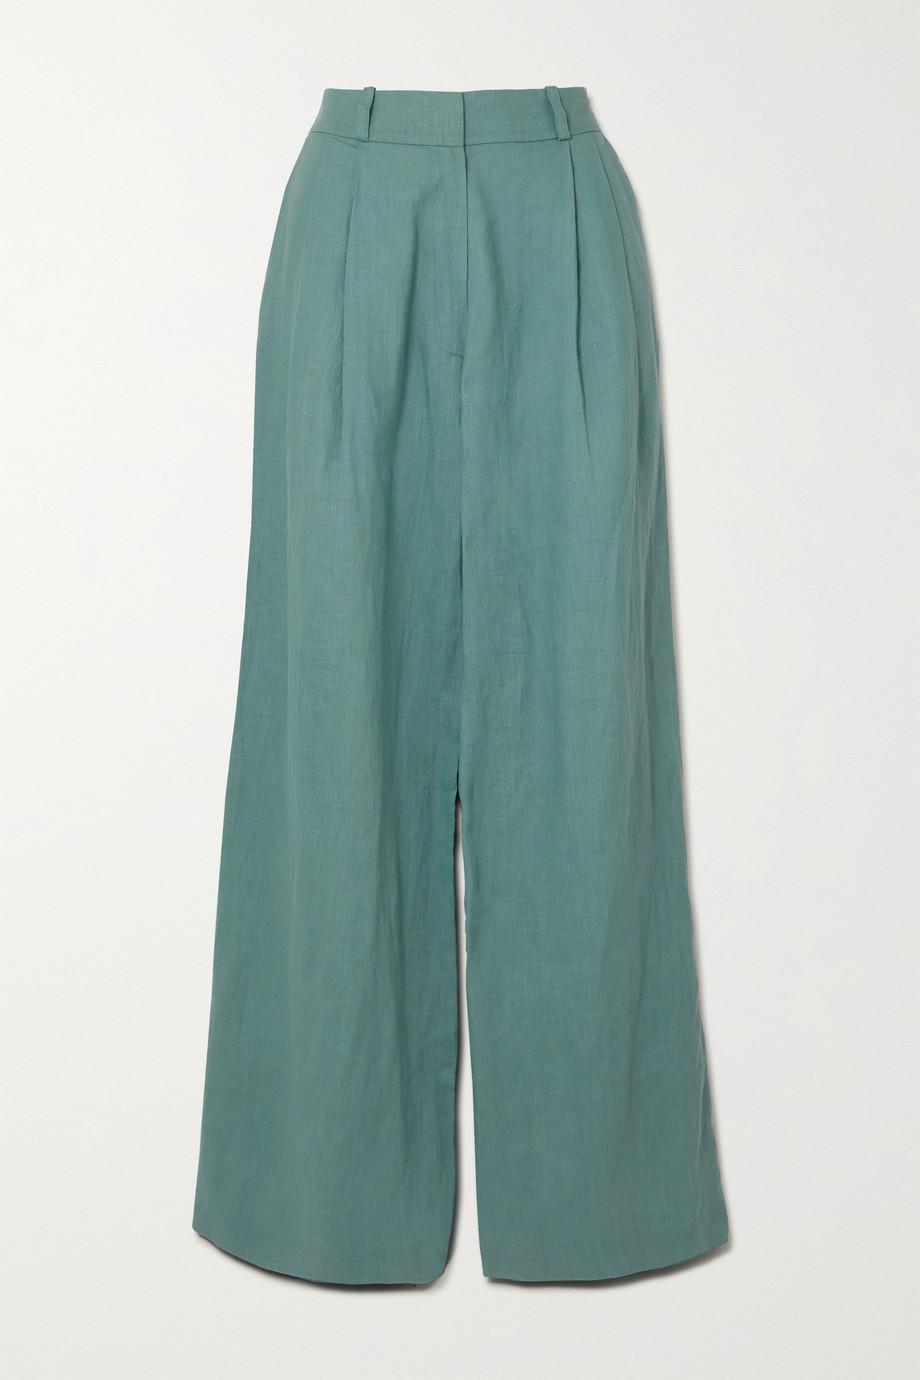 Miguelina Ainsley linen wide-leg pants